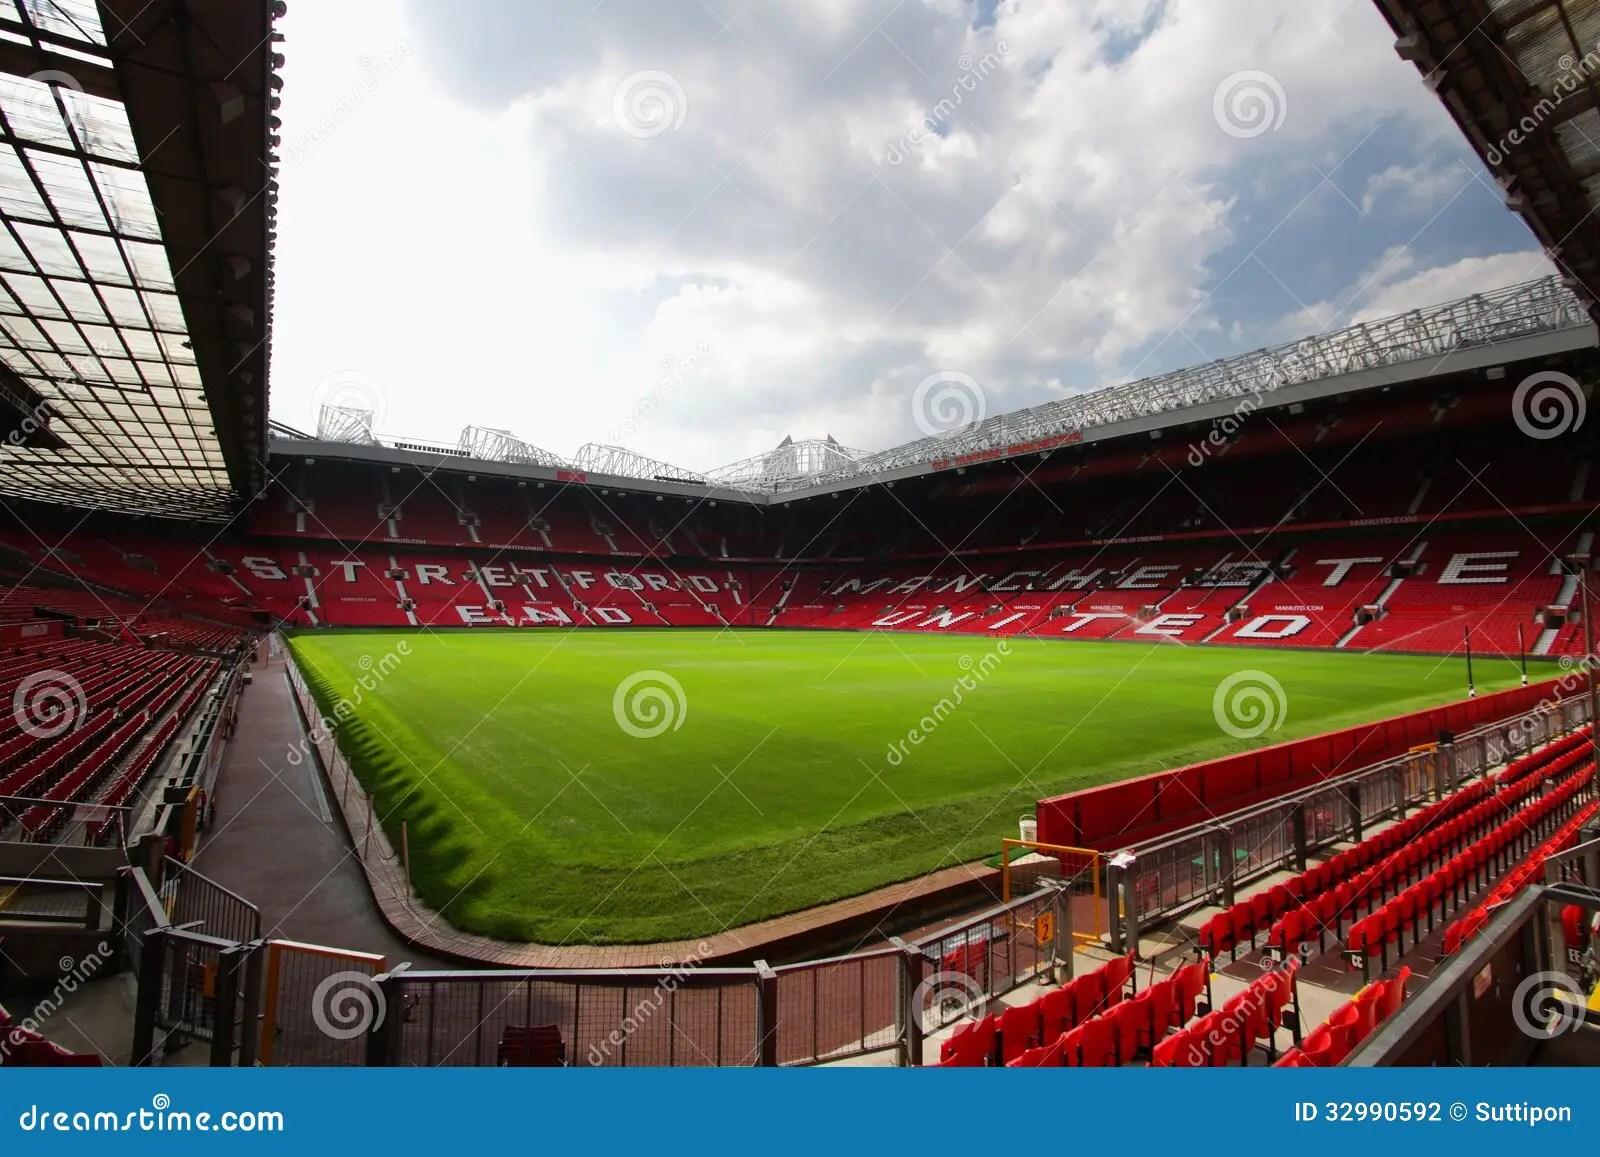 Old Trafford Stadium Editorial Photography - Image: 32990592